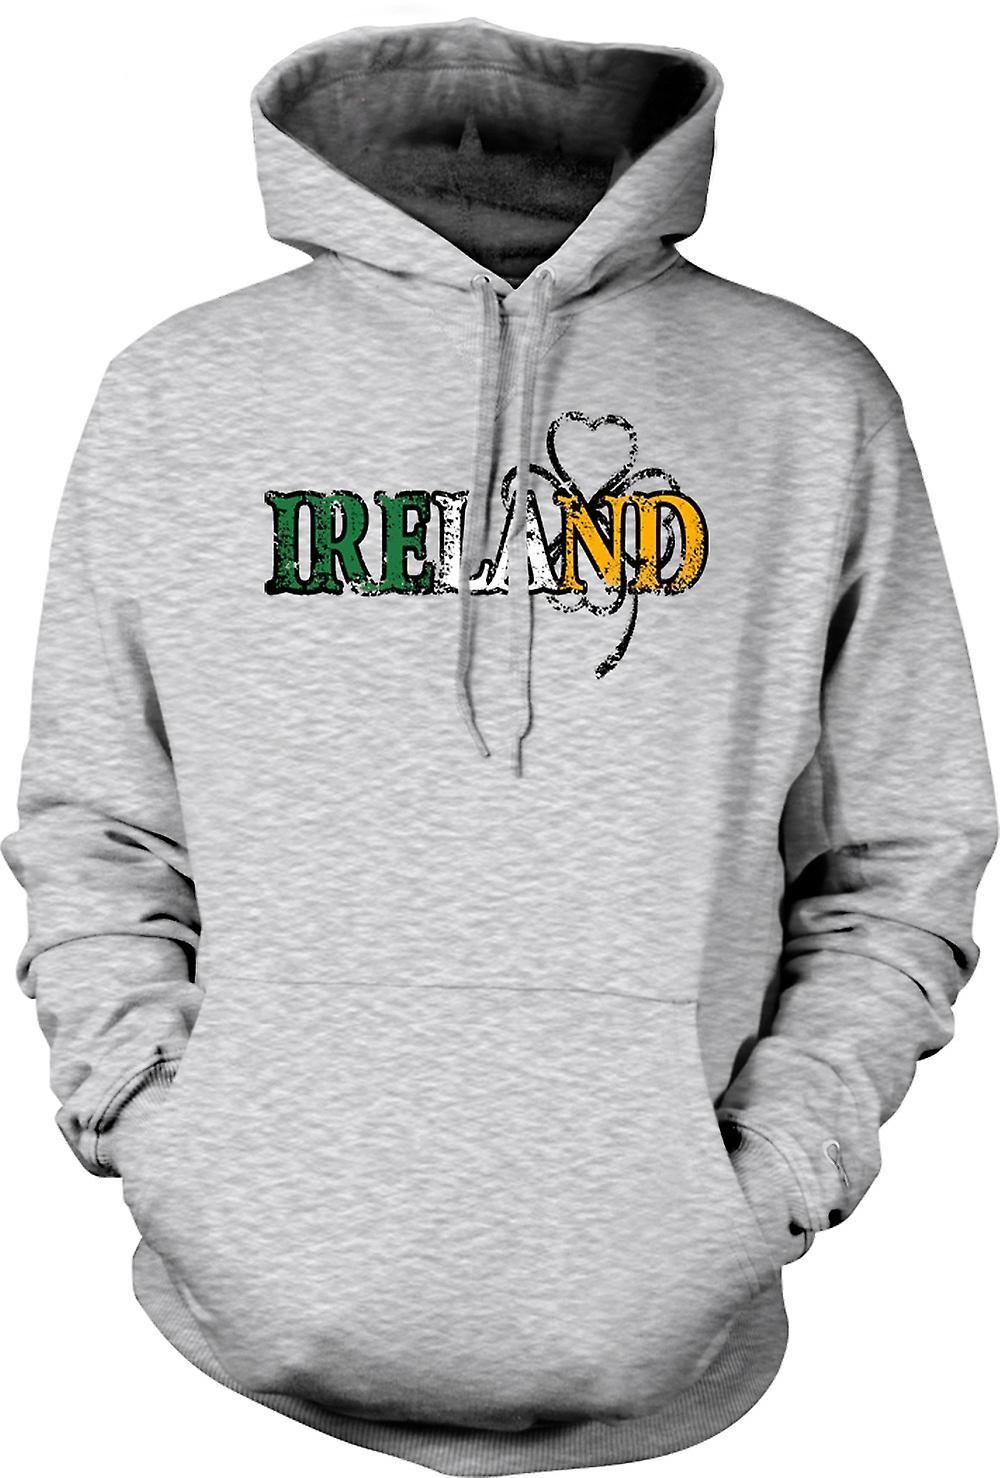 Mens Hoodie - Journée St Patricks - Irlande